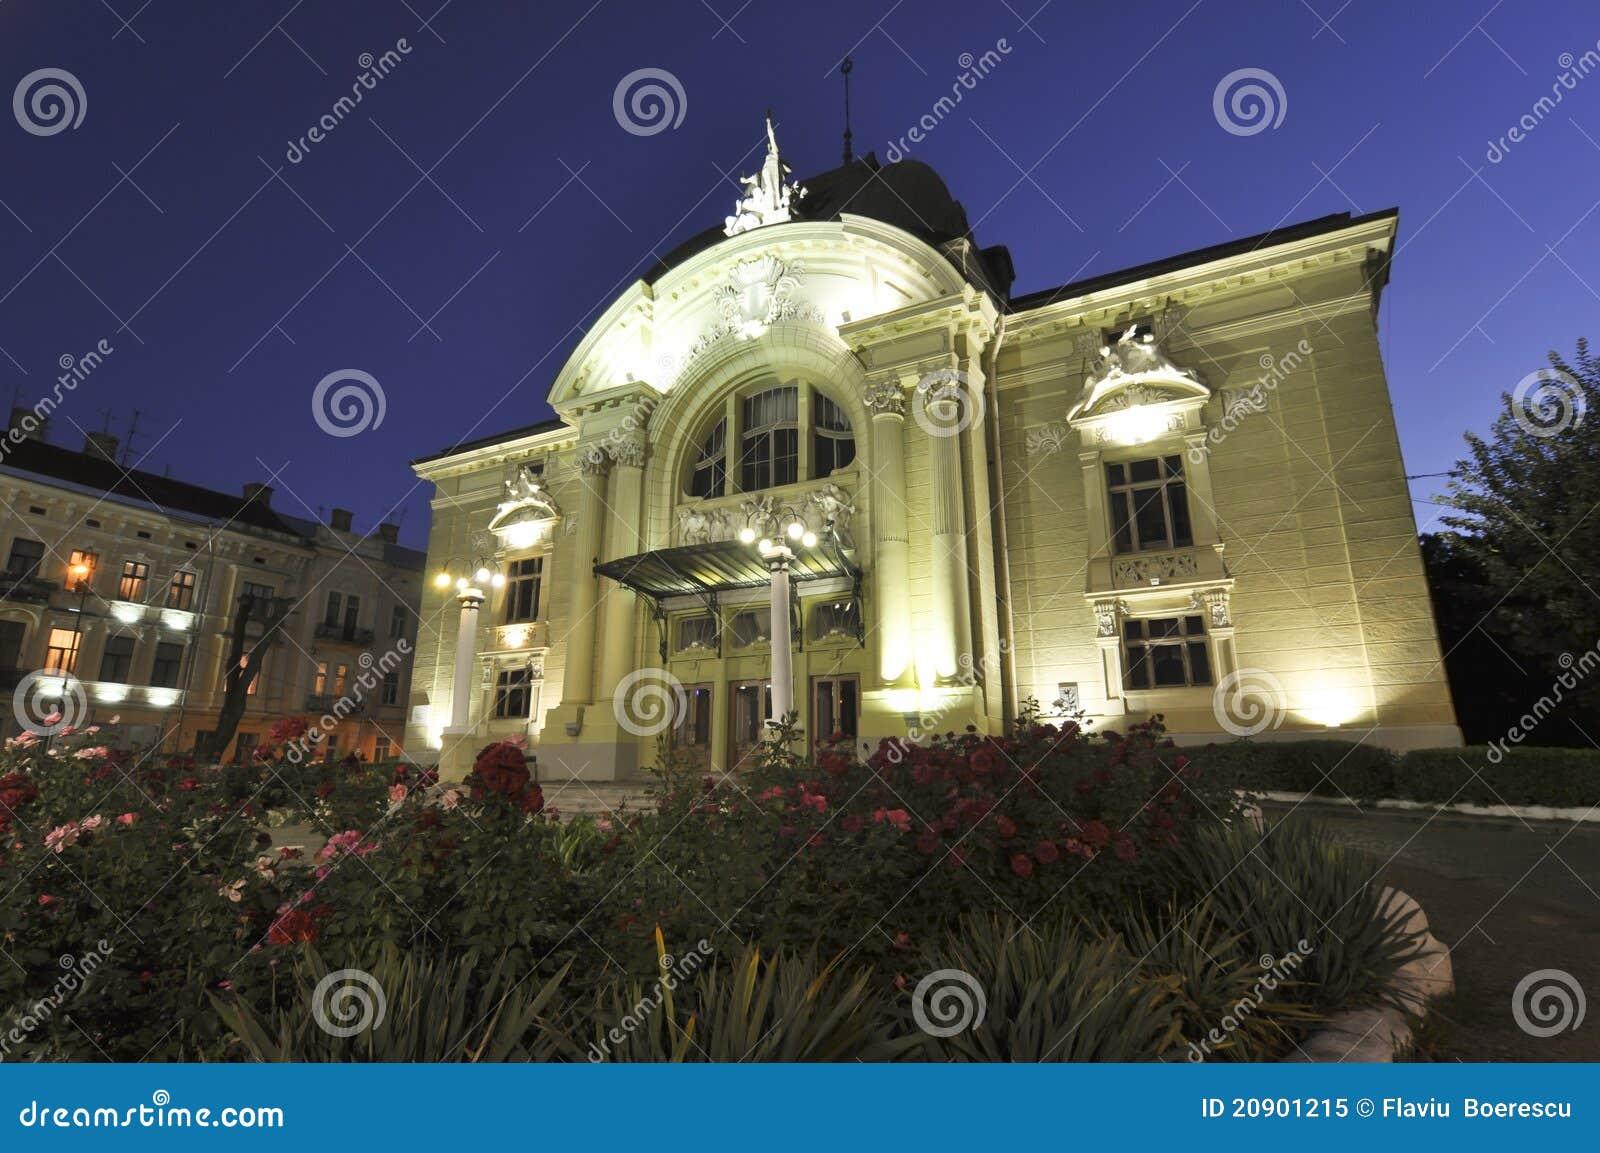 Baroque building of chernivtsi theater in ukraine stock image